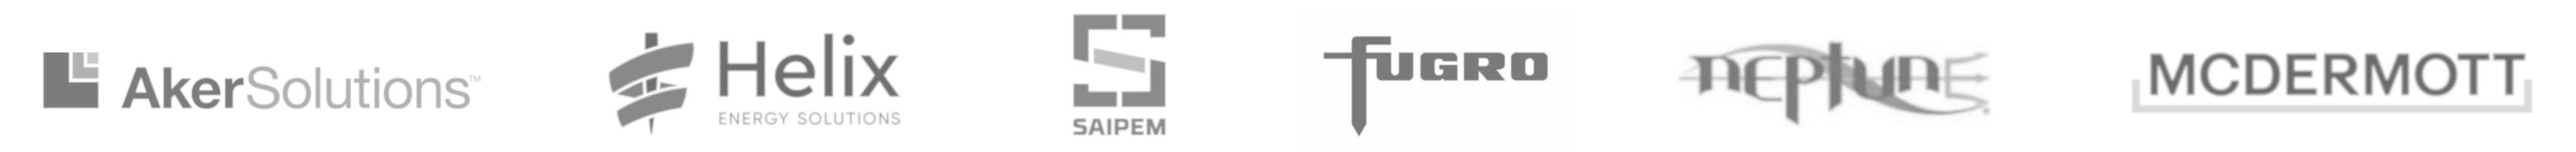 Long Logo2